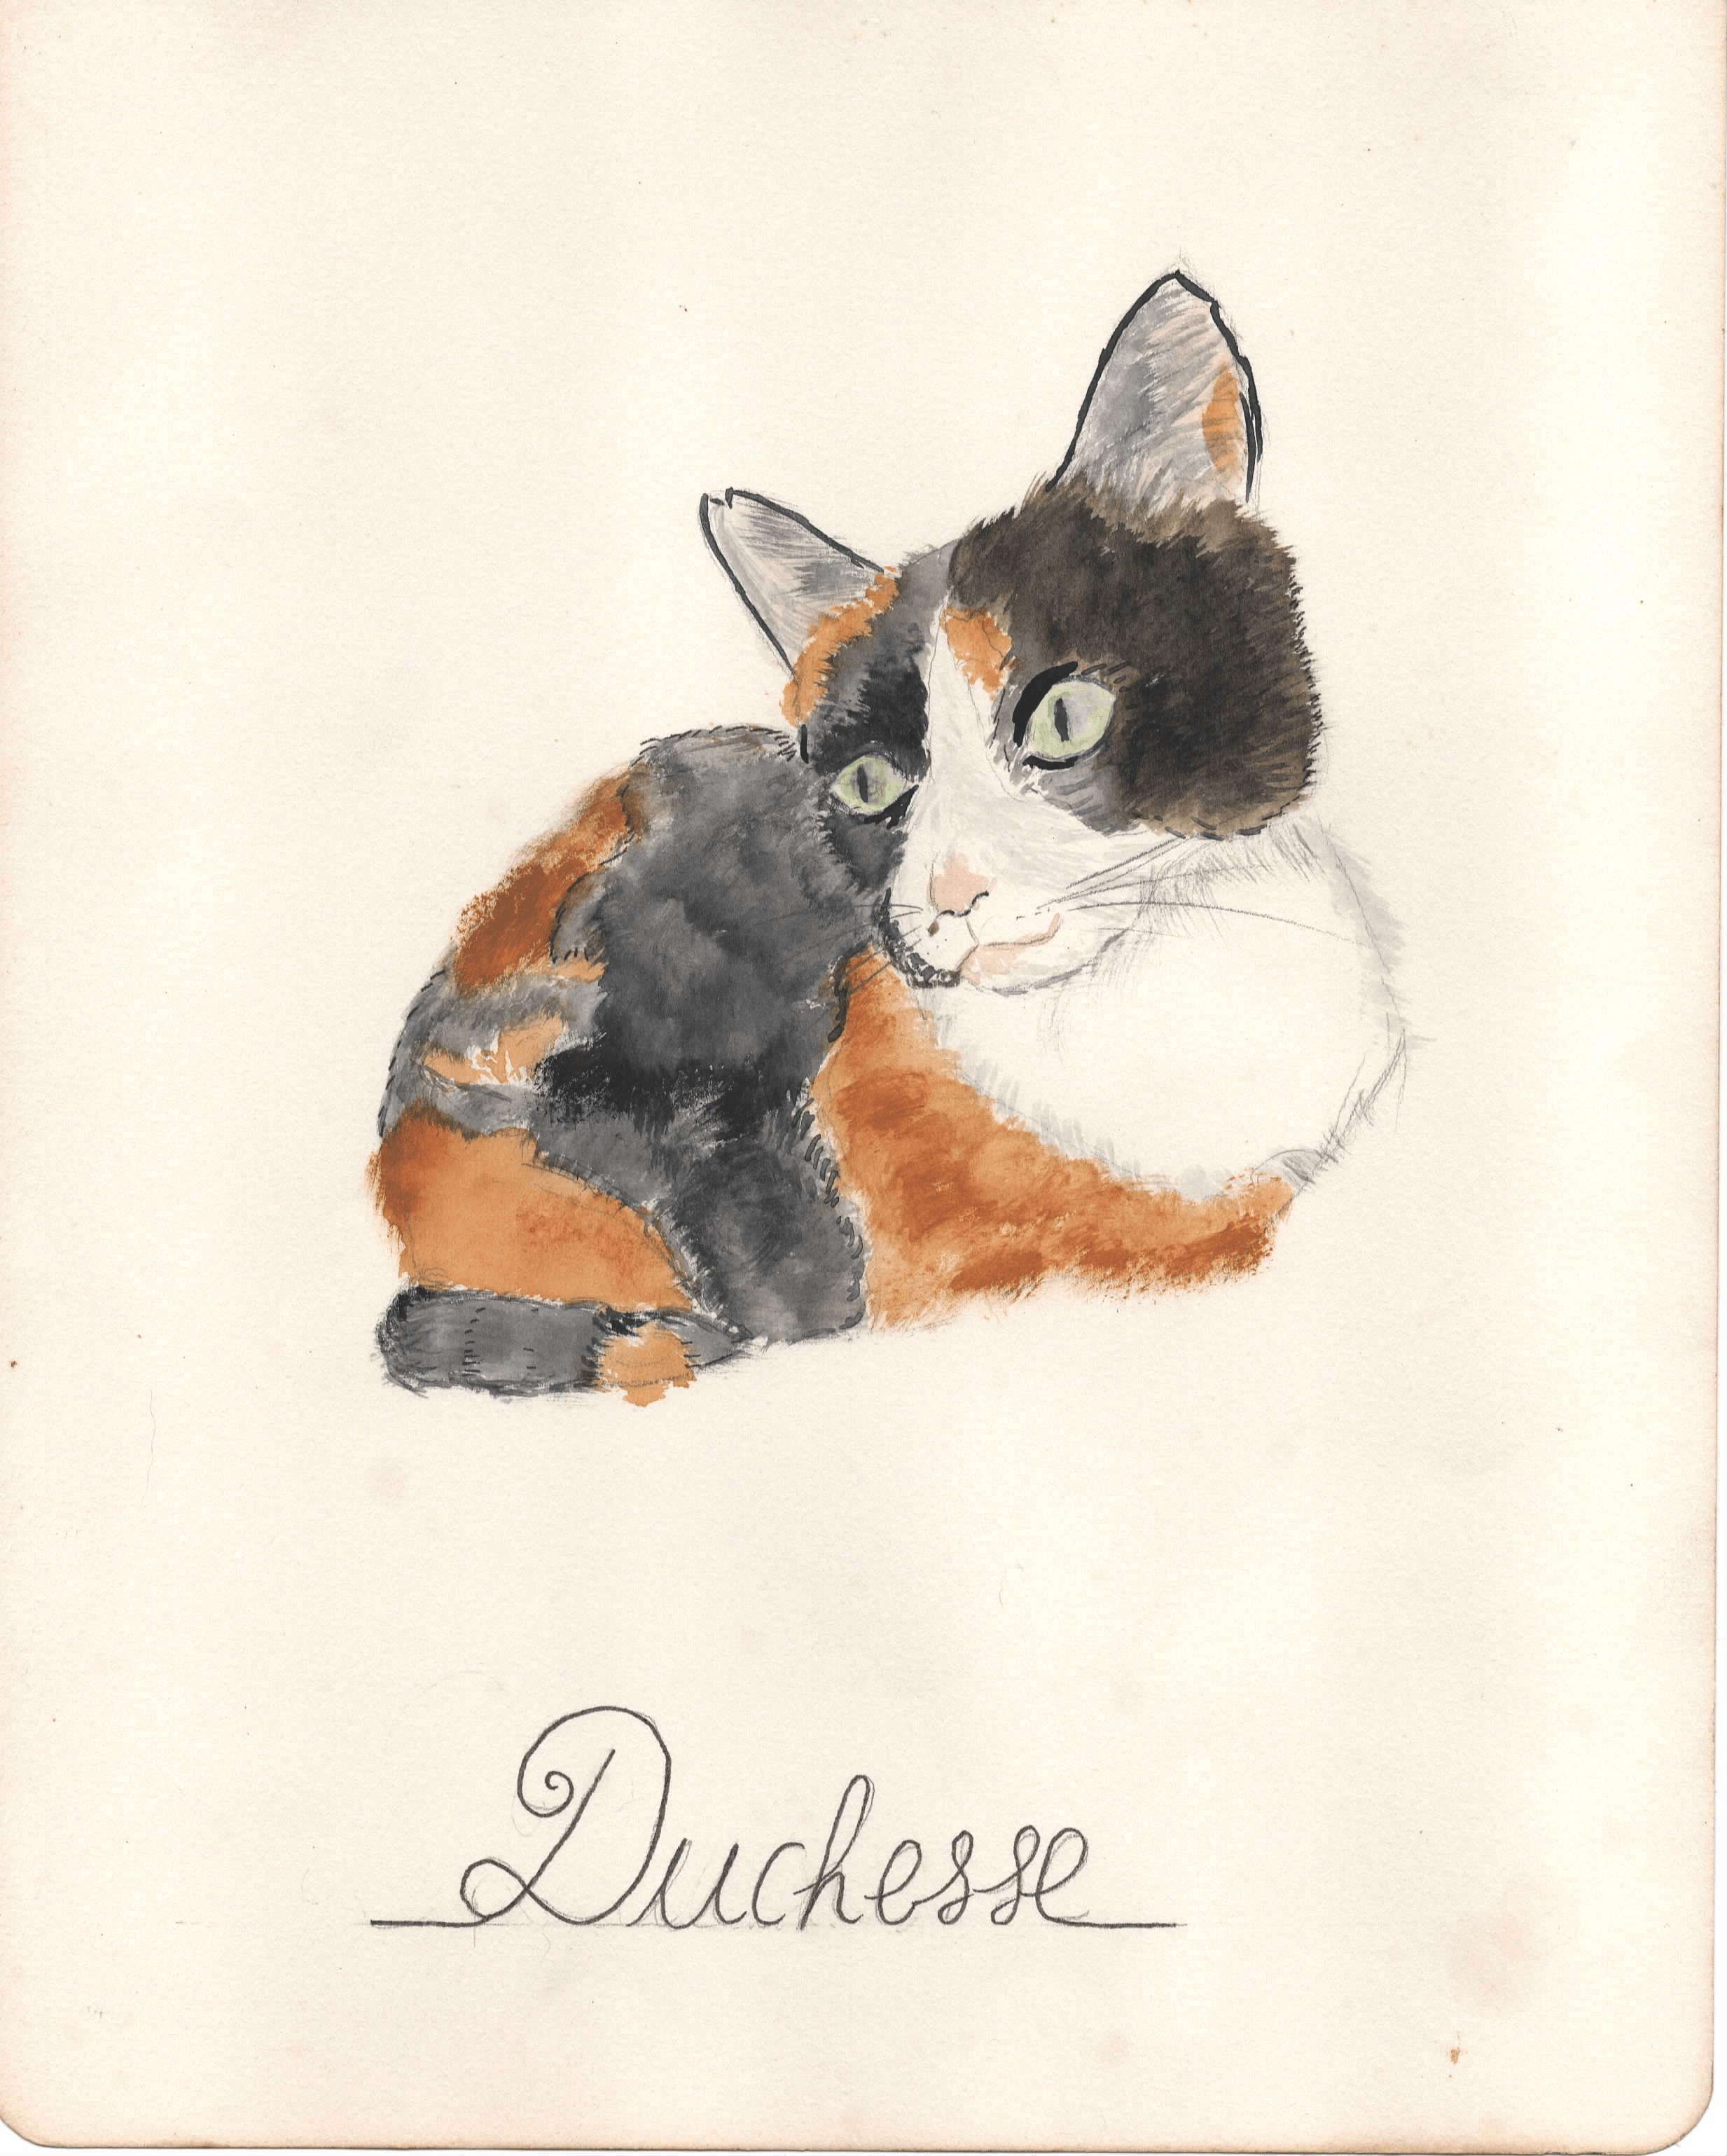 [Dessin du jour] Duchesse